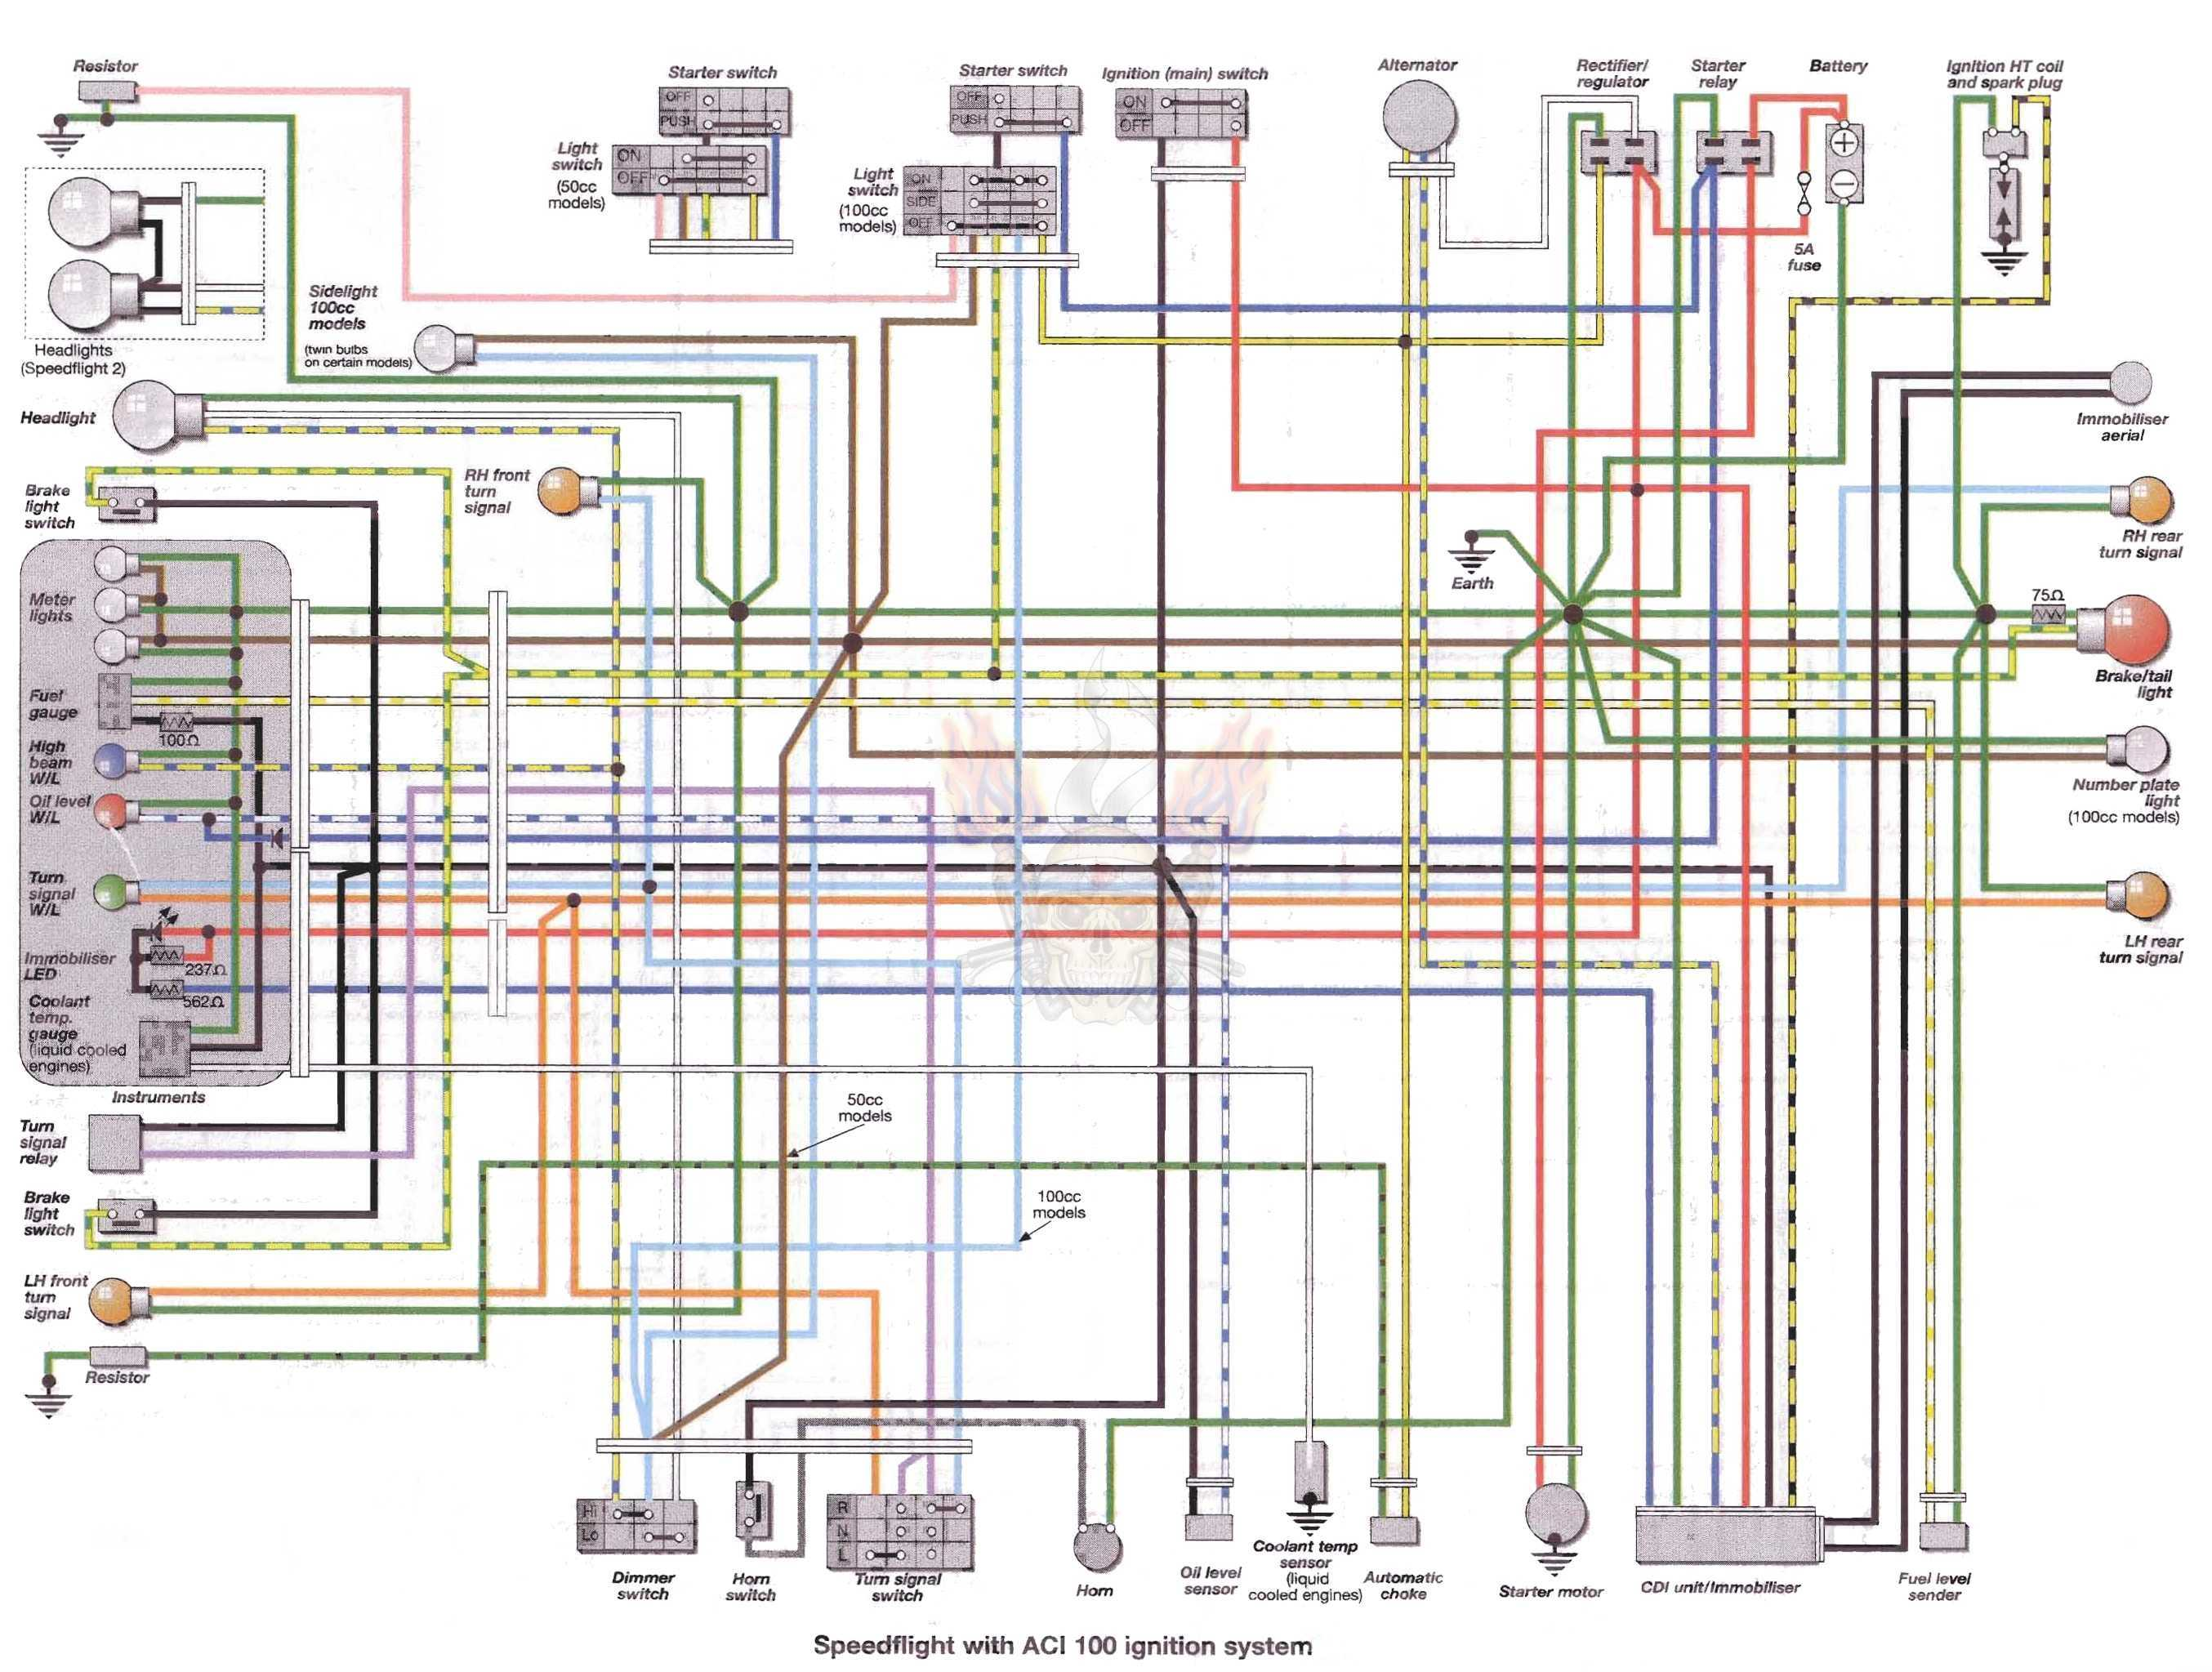 peugeot vivacity wiring diagram wiring wall furnace wiring diagrams, Wiring diagram